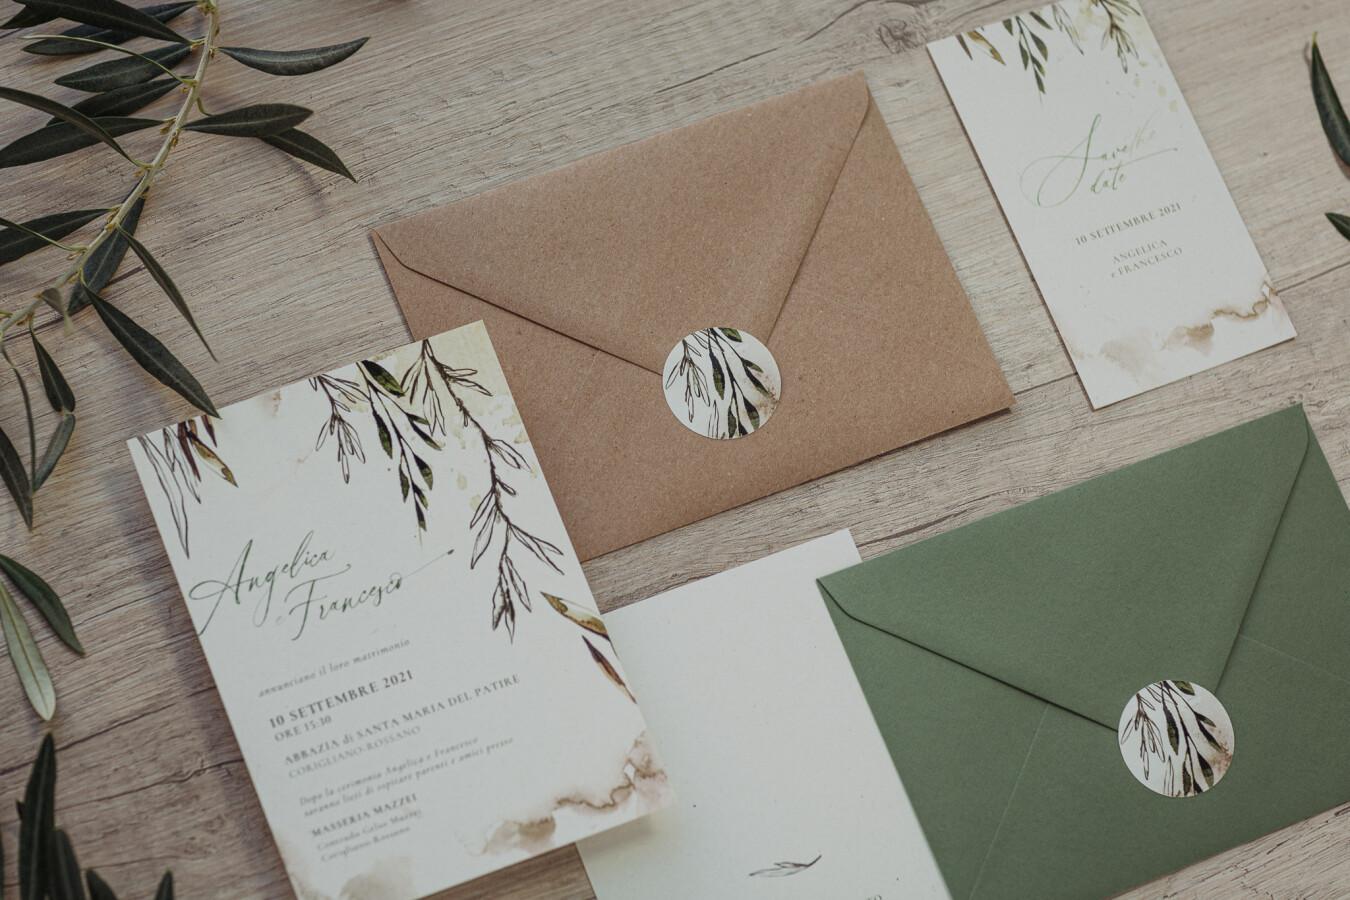 Partecipazioni nozze Ulivo - Wedsign